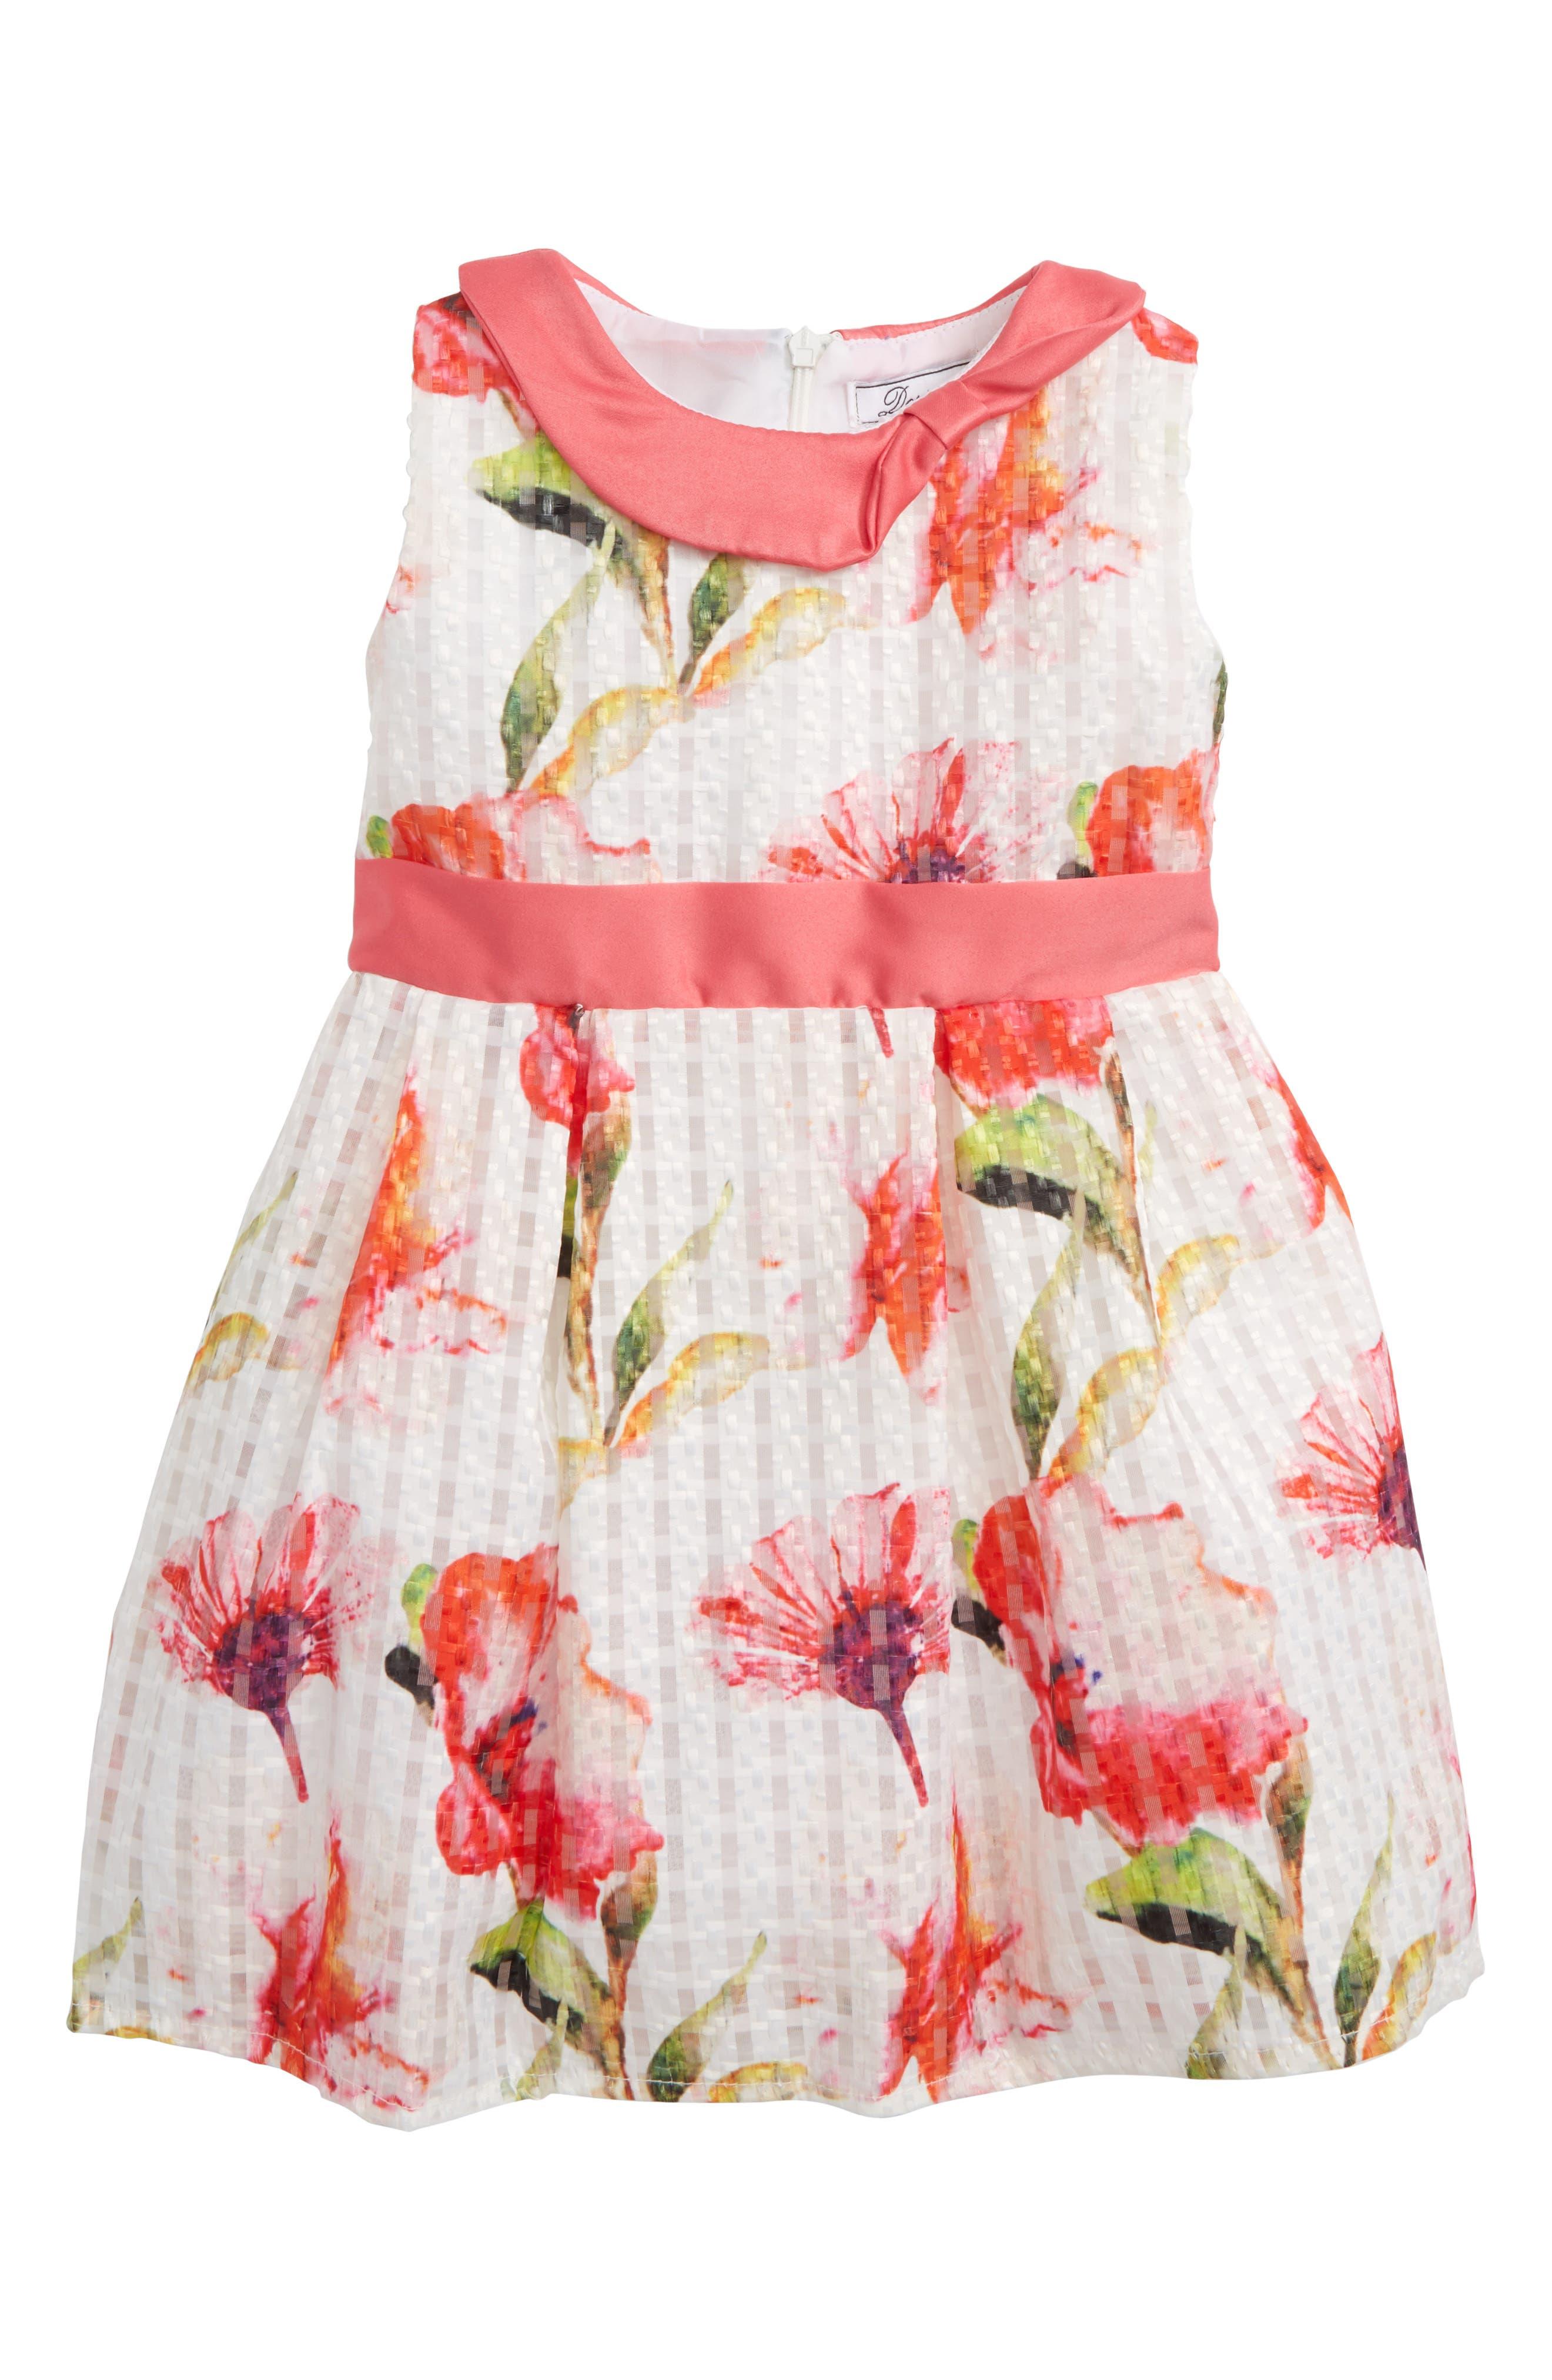 Veronica Flower Party Dress,                             Main thumbnail 1, color,                             Multi Print